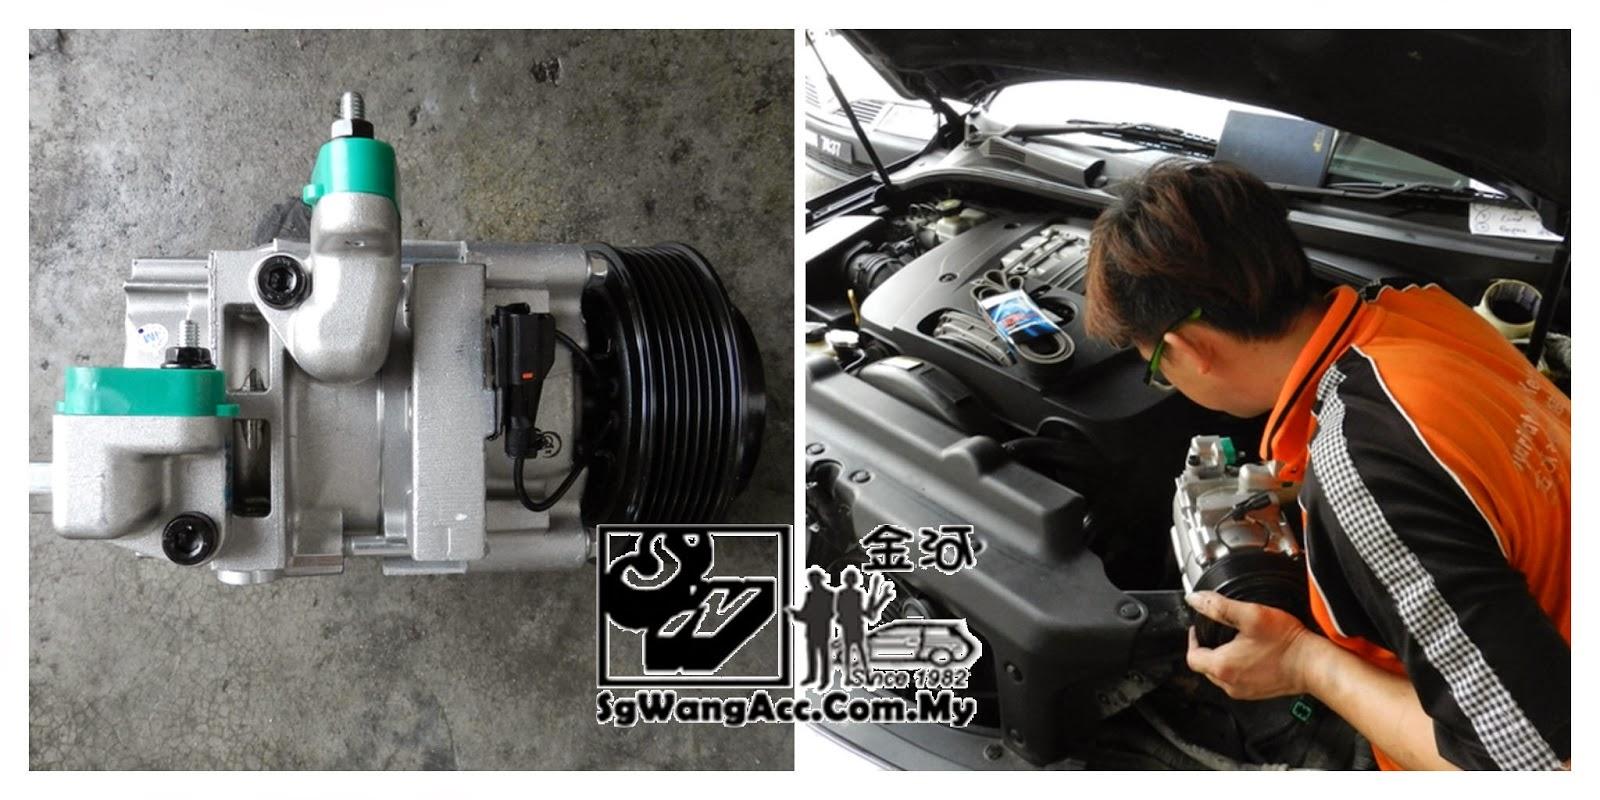 wts car air cond consultation solution service [ 1600 x 800 Pixel ]